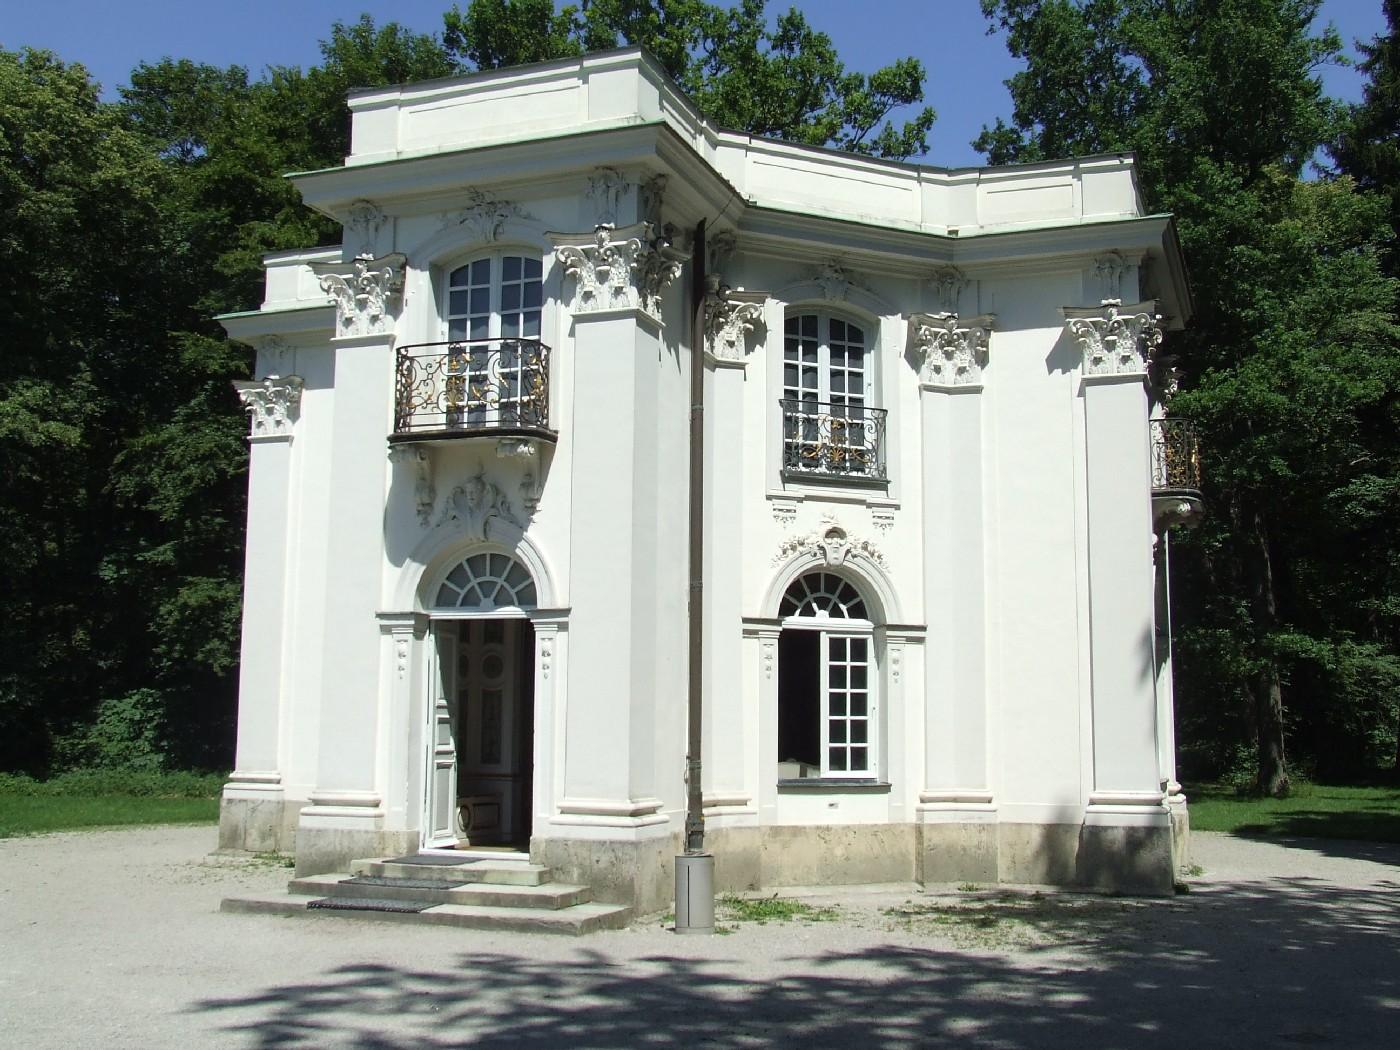 munchen_pagodenburg_joseph_effner_1716-19.JPG